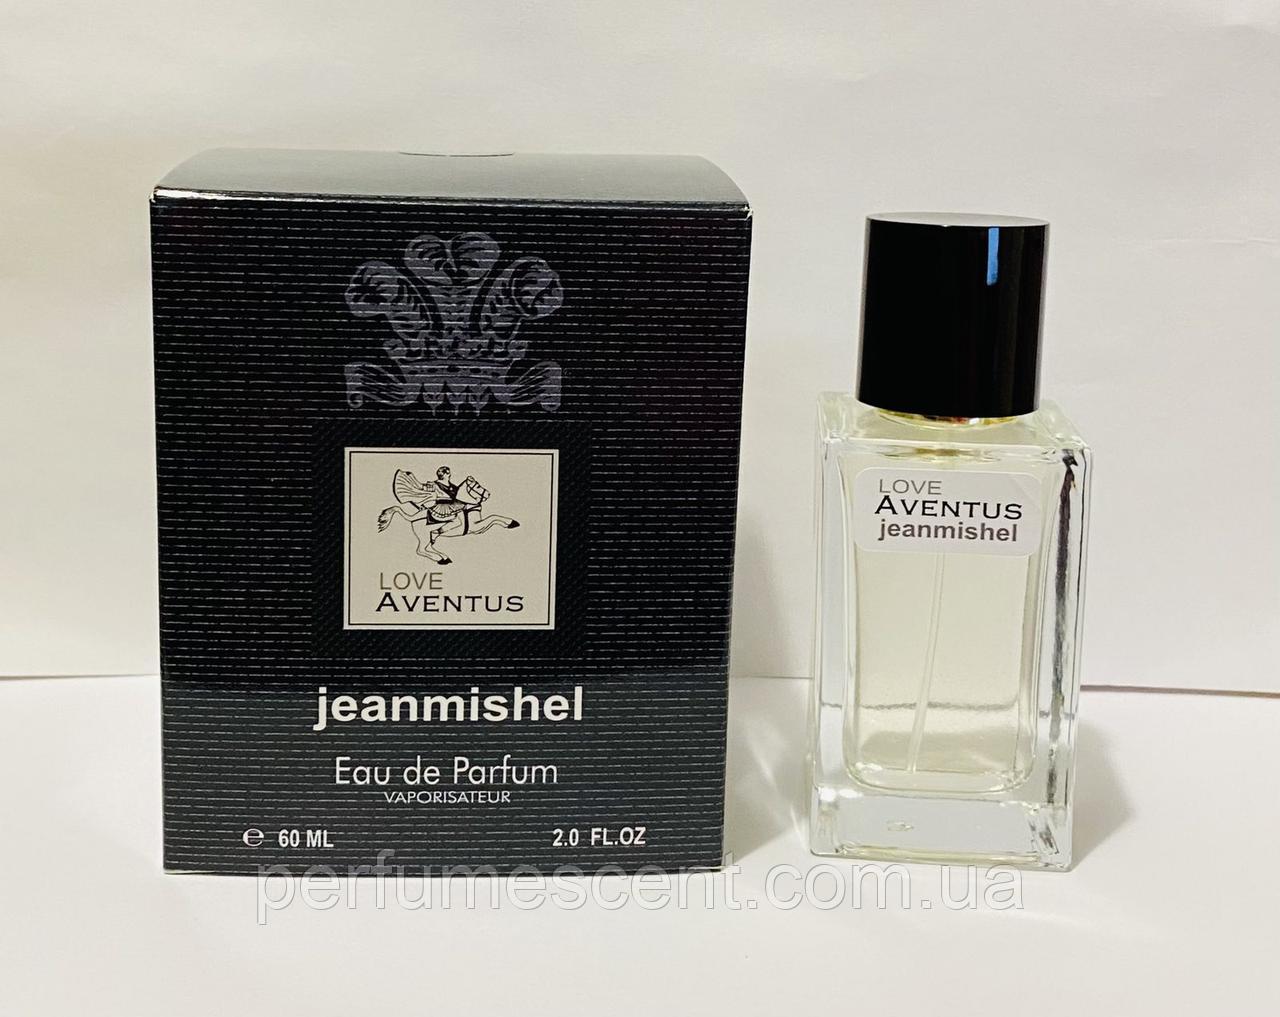 60 мл Мини-парфюм JEANMISHEL LOVE  AVENTUS  (м) 115 кубик